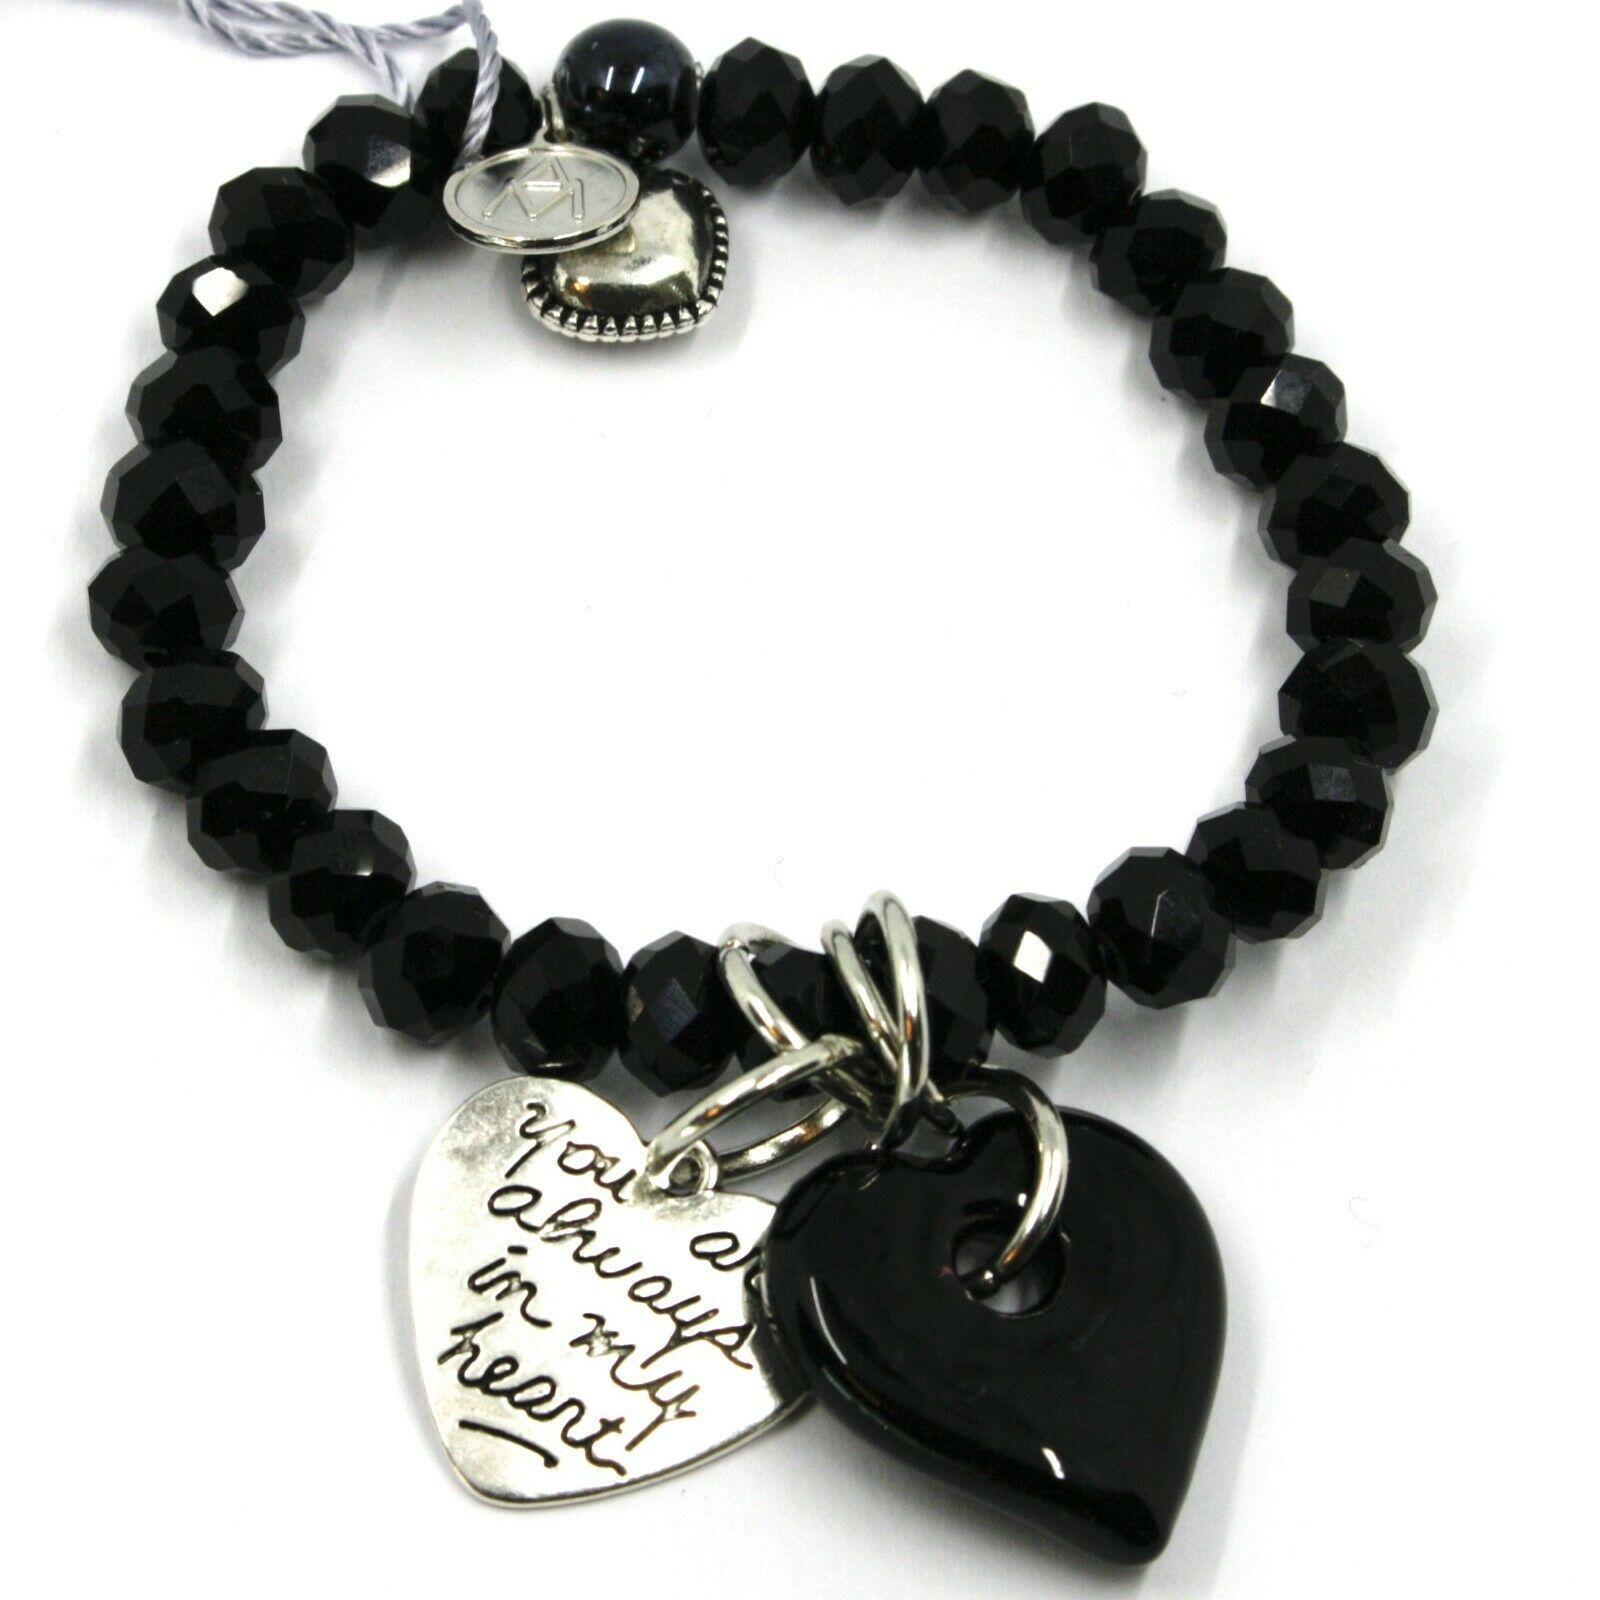 Elastic Bracelet Antica Murrina Venezia, BR844A14, Double Heart Glass Black